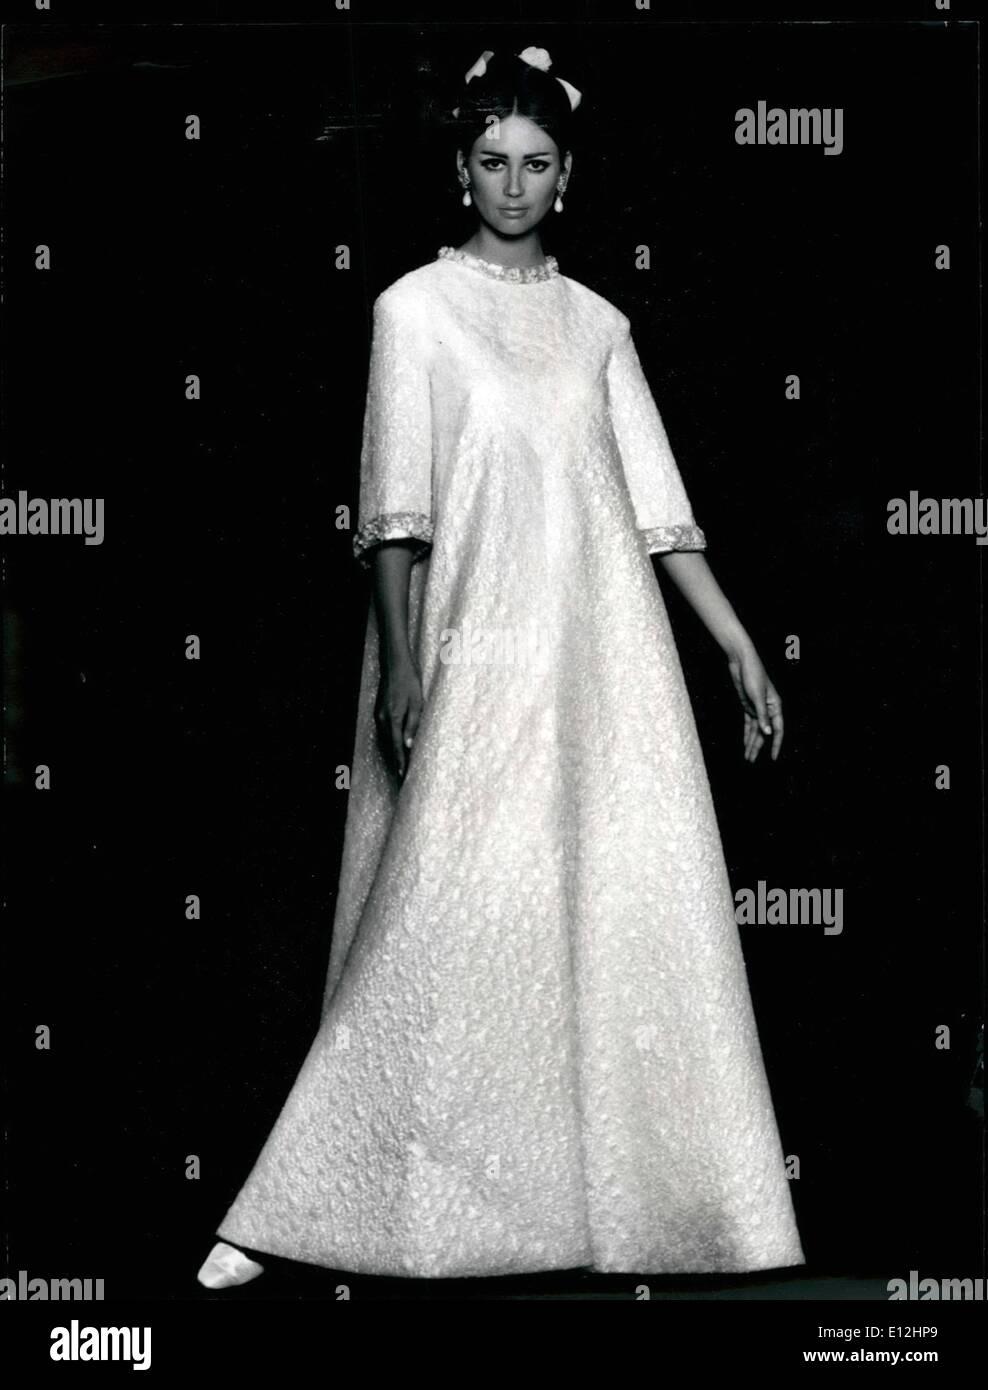 Jan. 04, 2012 - Paris Fashions. OPS: Silver lame wedding dress designed by Guy Laroche. ne Z - Stock Image